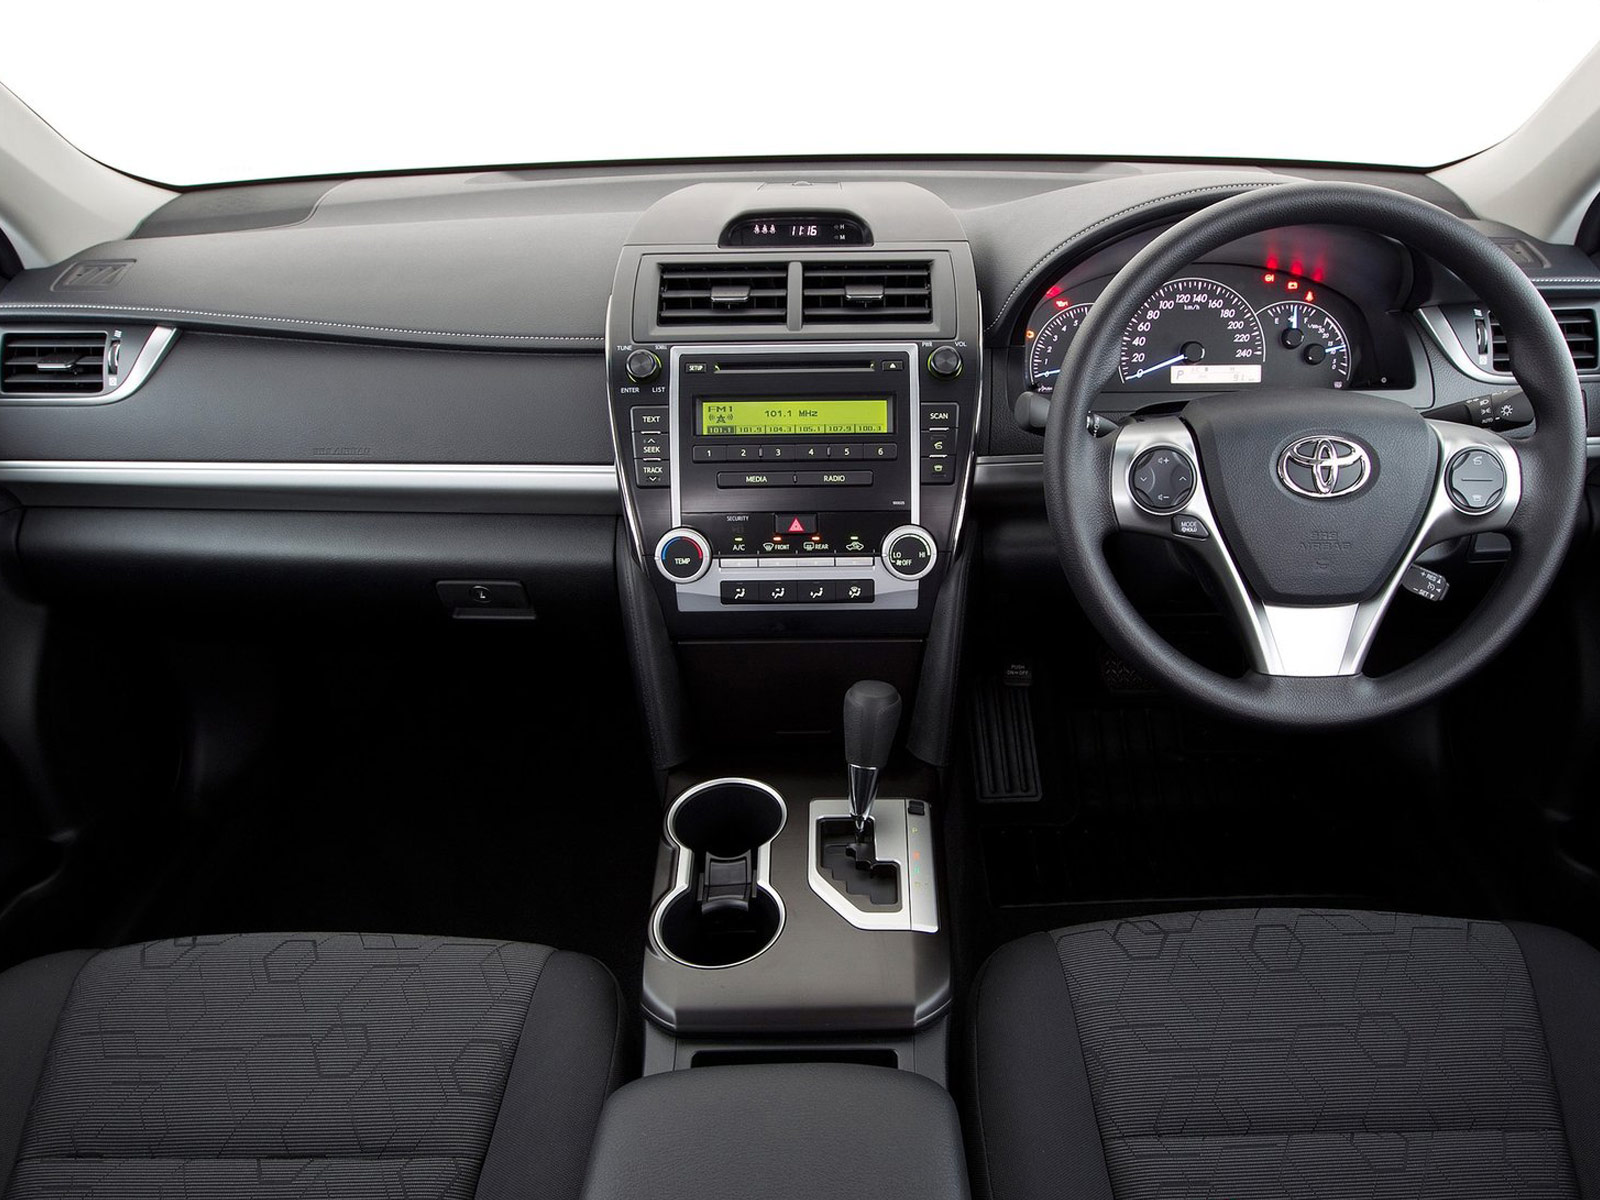 http://1.bp.blogspot.com/-WxkMz2xKWo0/Twz3n_Ee7kI/AAAAAAAAL2M/Z_J7VhzVrdg/s1600/2012-Toyota-Camry-AU-Version_japanese-car-wallpapers_11.jpg